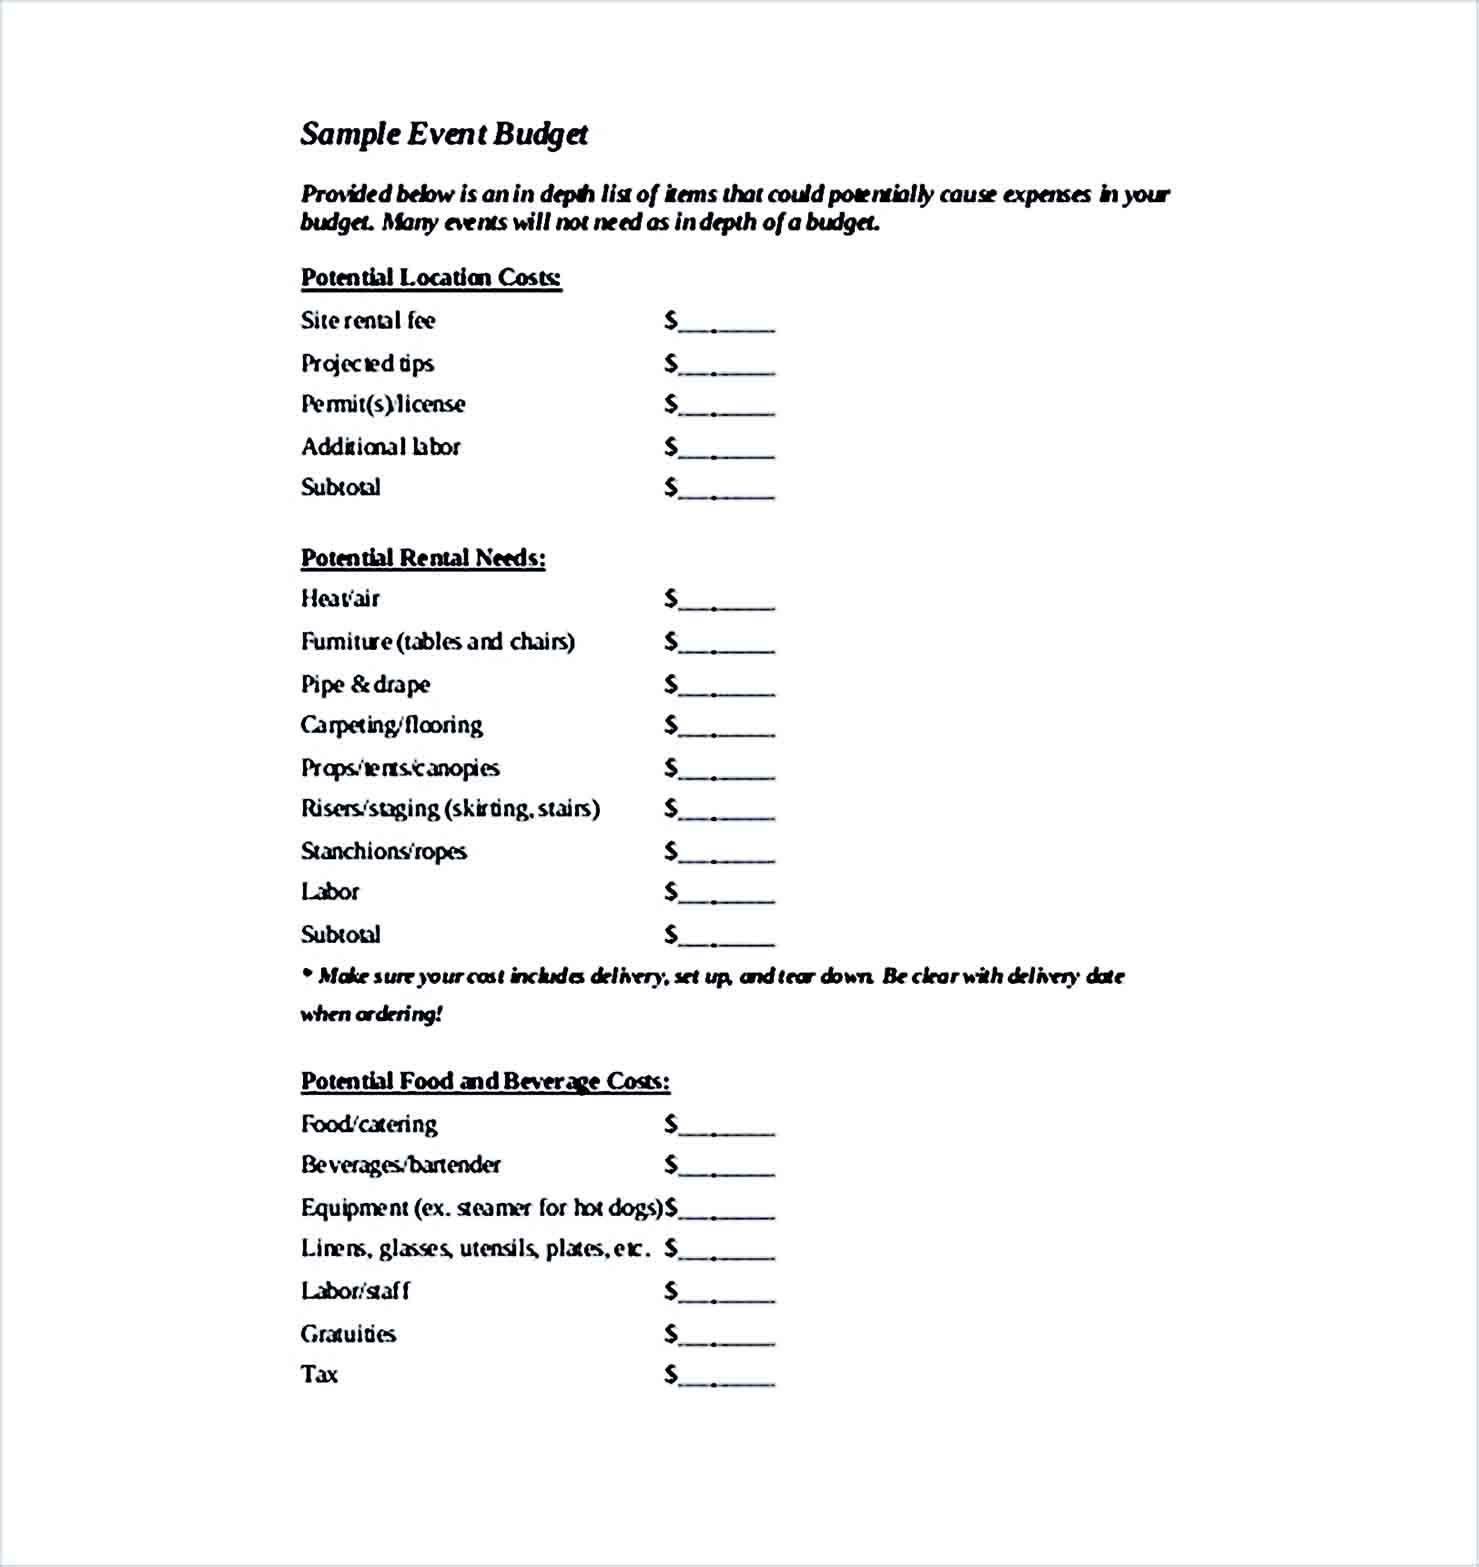 Sample Event Budget 002